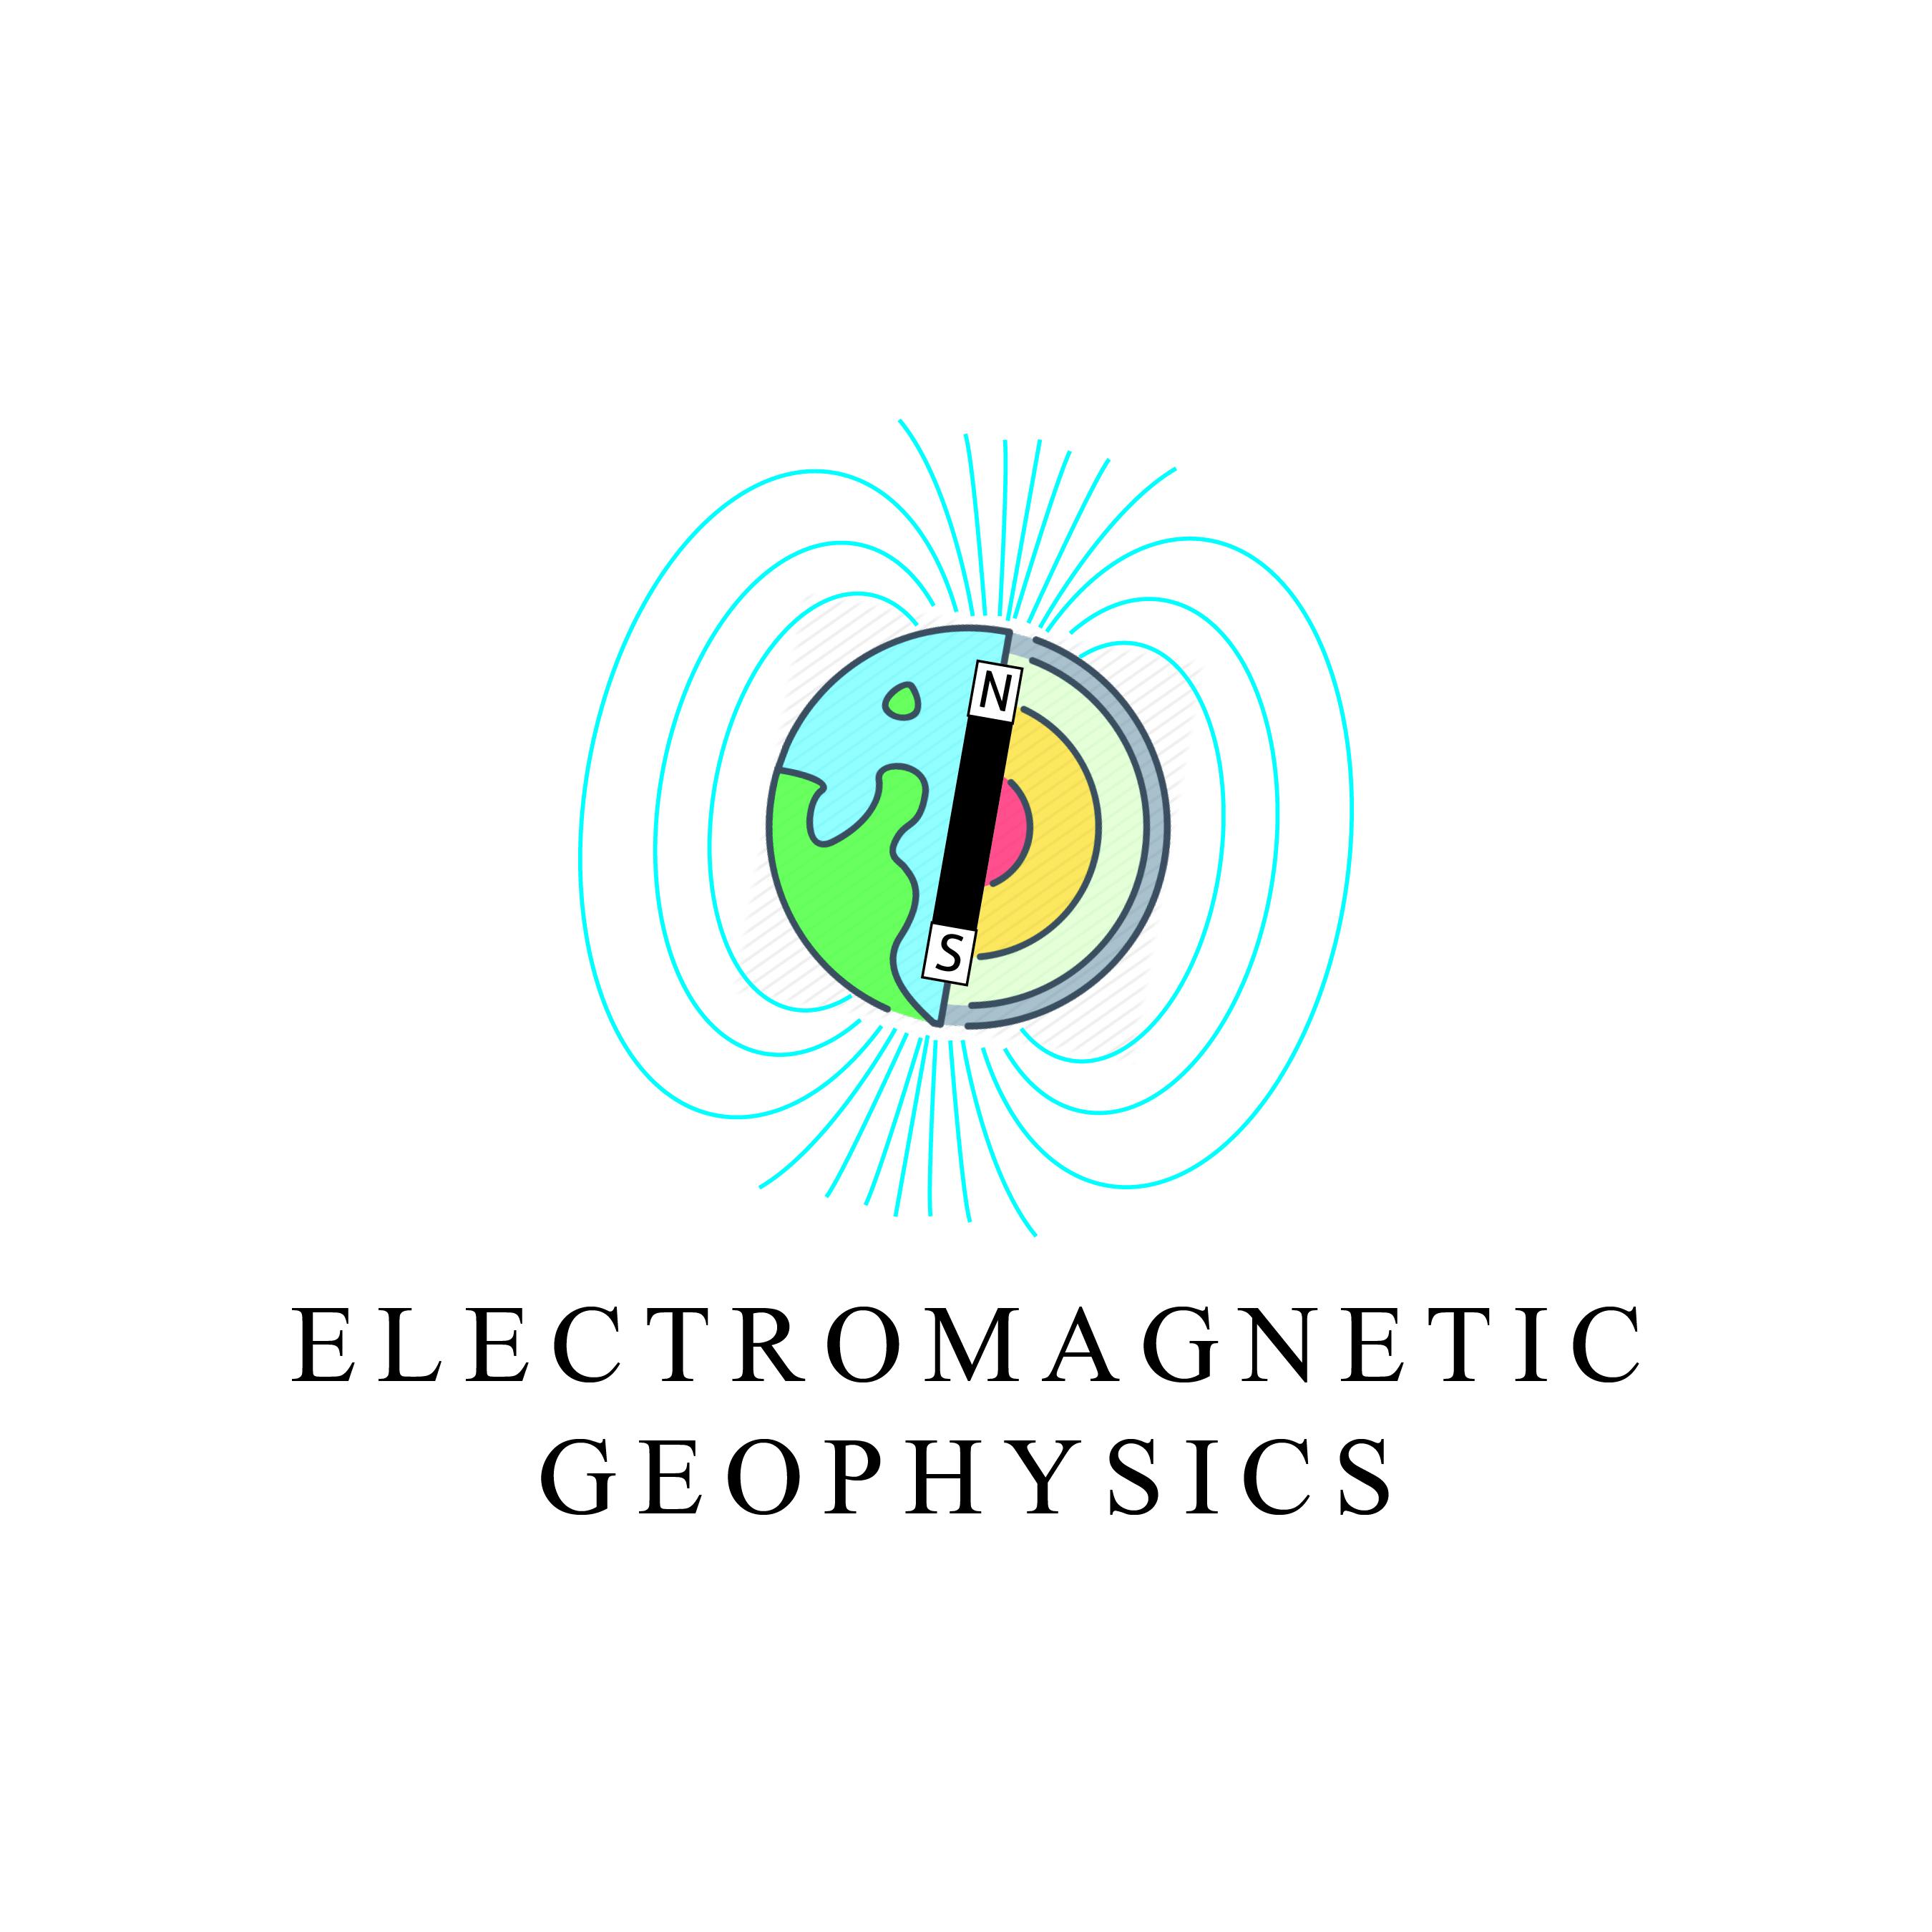 Electromagnetic Geophysics